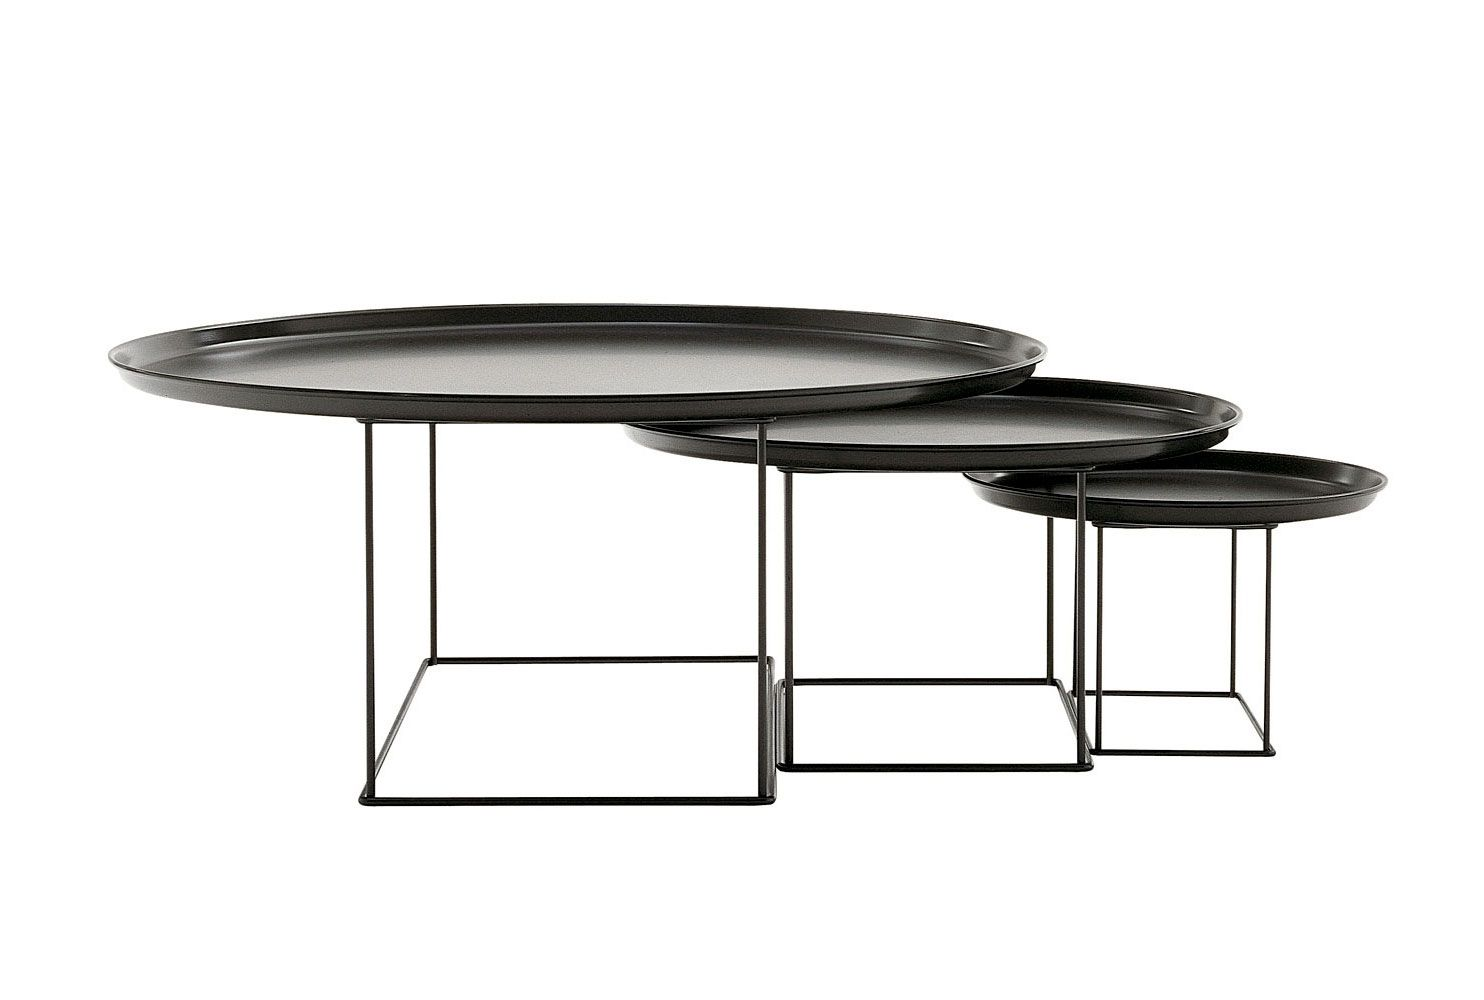 Tables amp;b CollectionB BassesFat Italia DesignPatricia NnPwk80OX